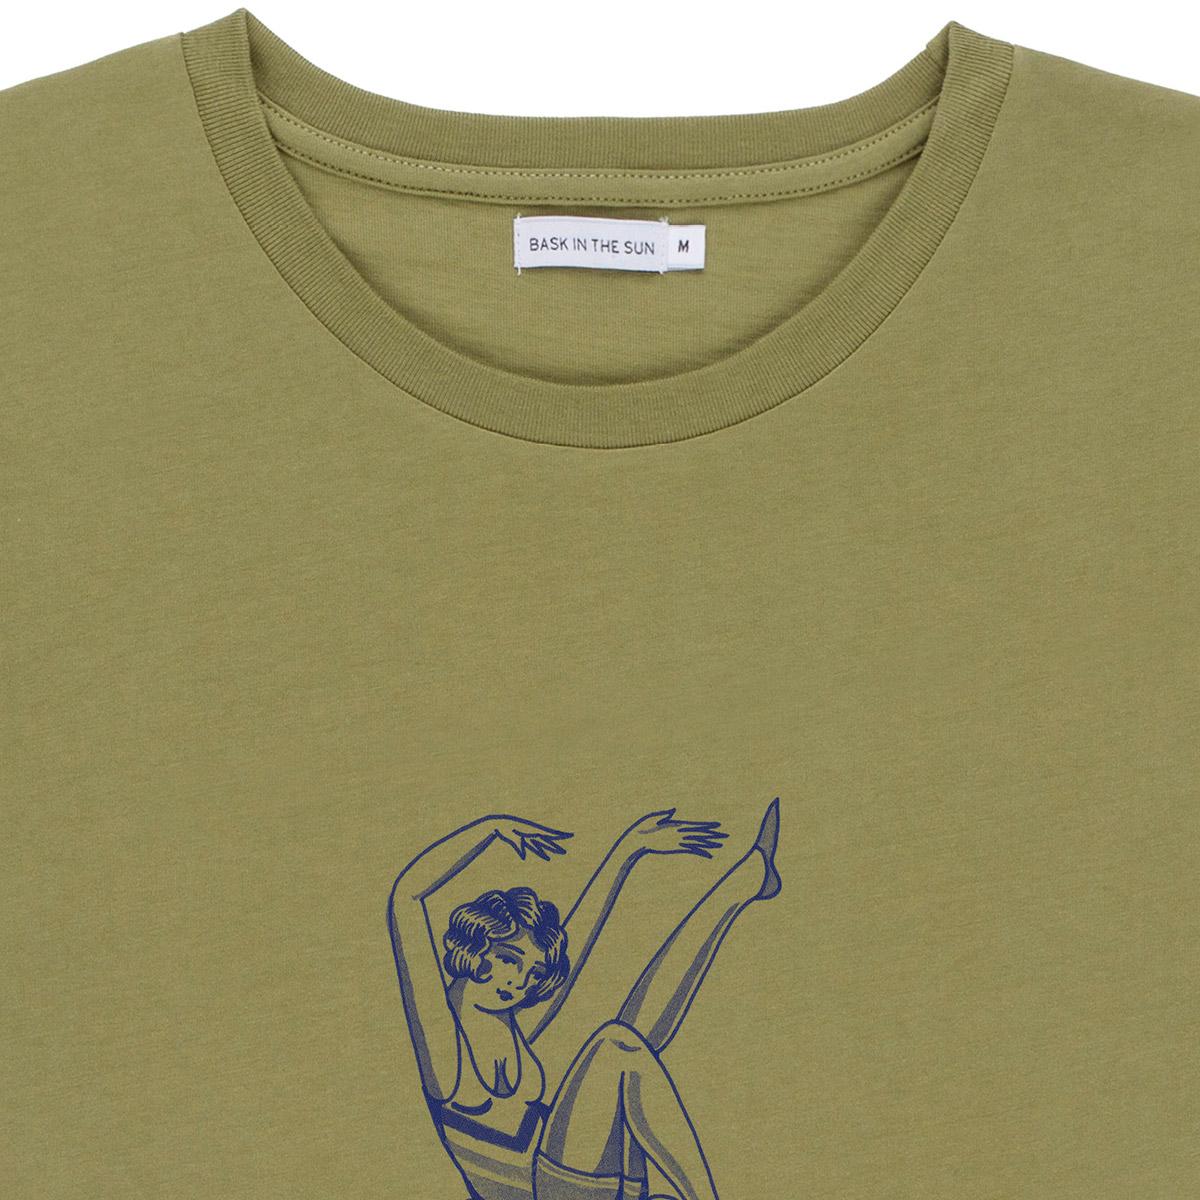 T-shirt en coton bio kaki smoking fish - Bask in the Sun num 2